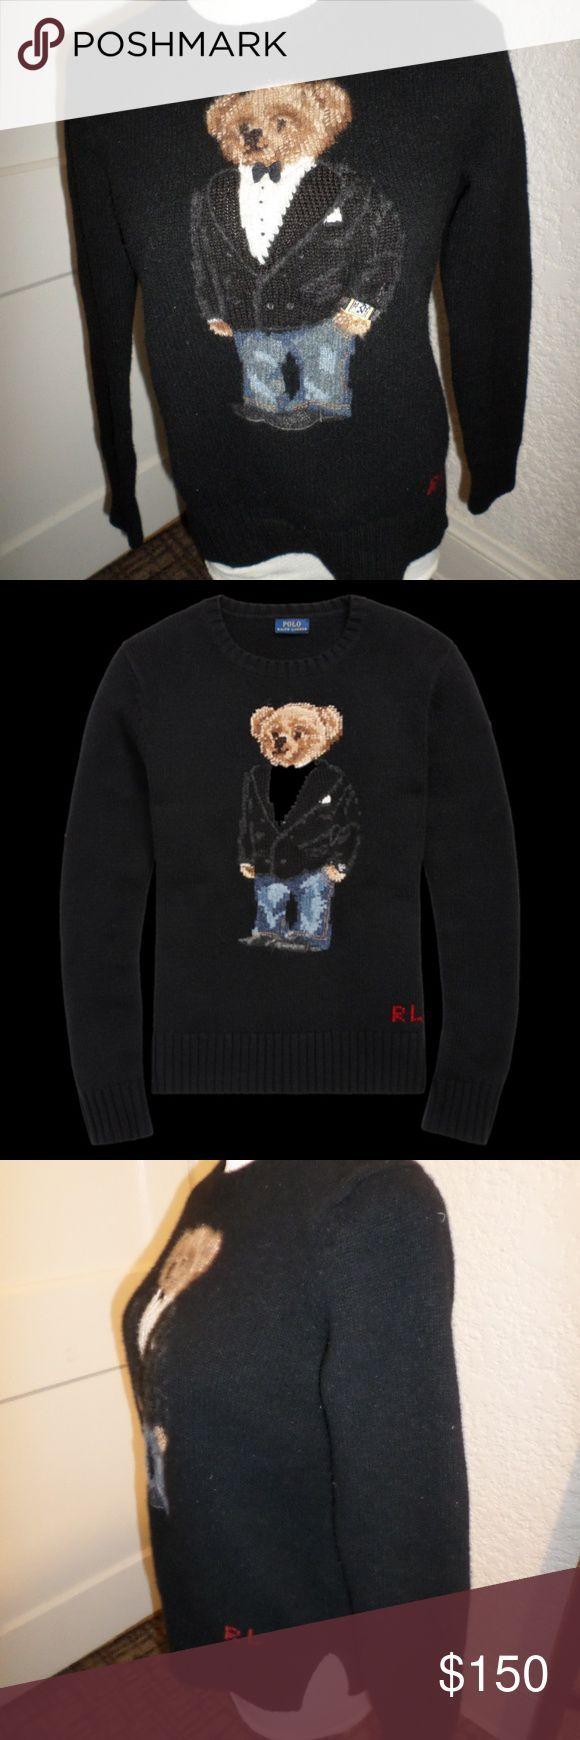 Tuxedo Wool Polo Lauren Signa Ralph Sweater Bear S zLGSUVMpq